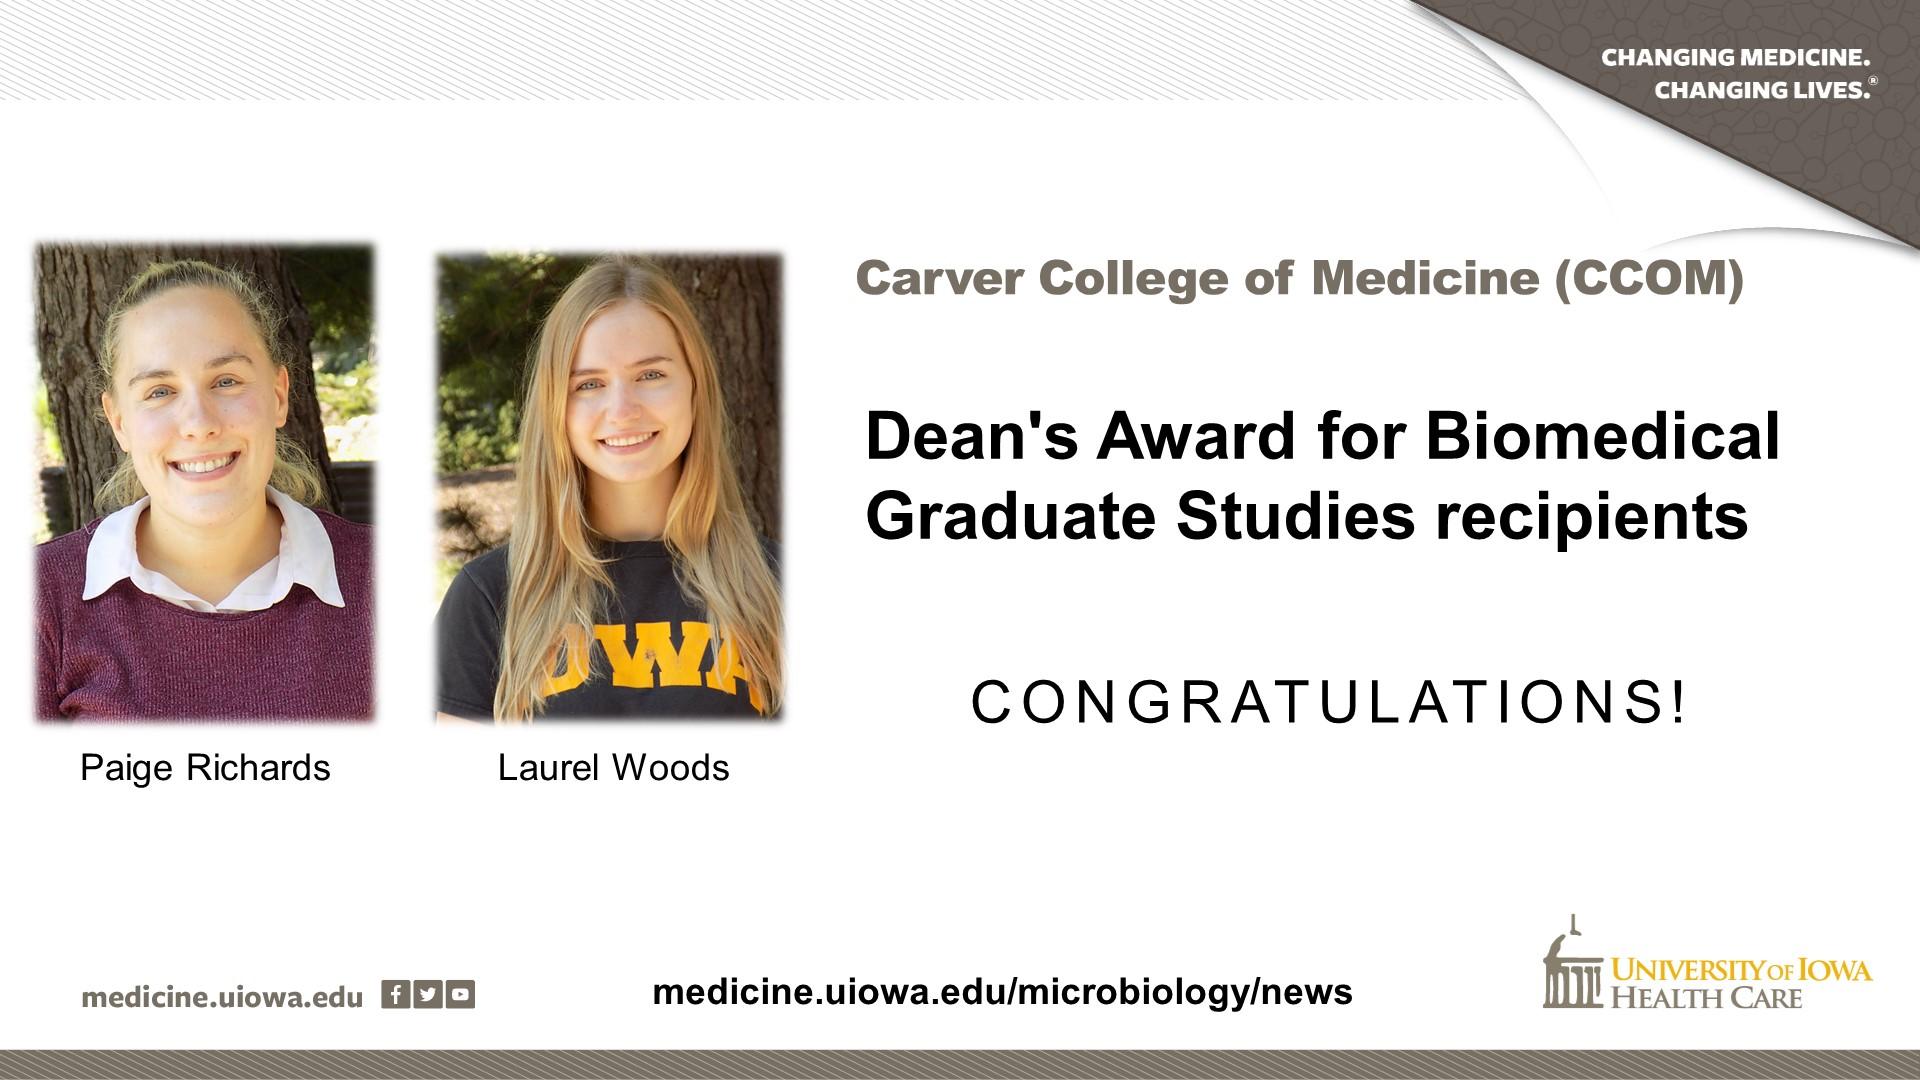 aige and Laurel Dean's Award for Biomedical Graduate Studies recipients